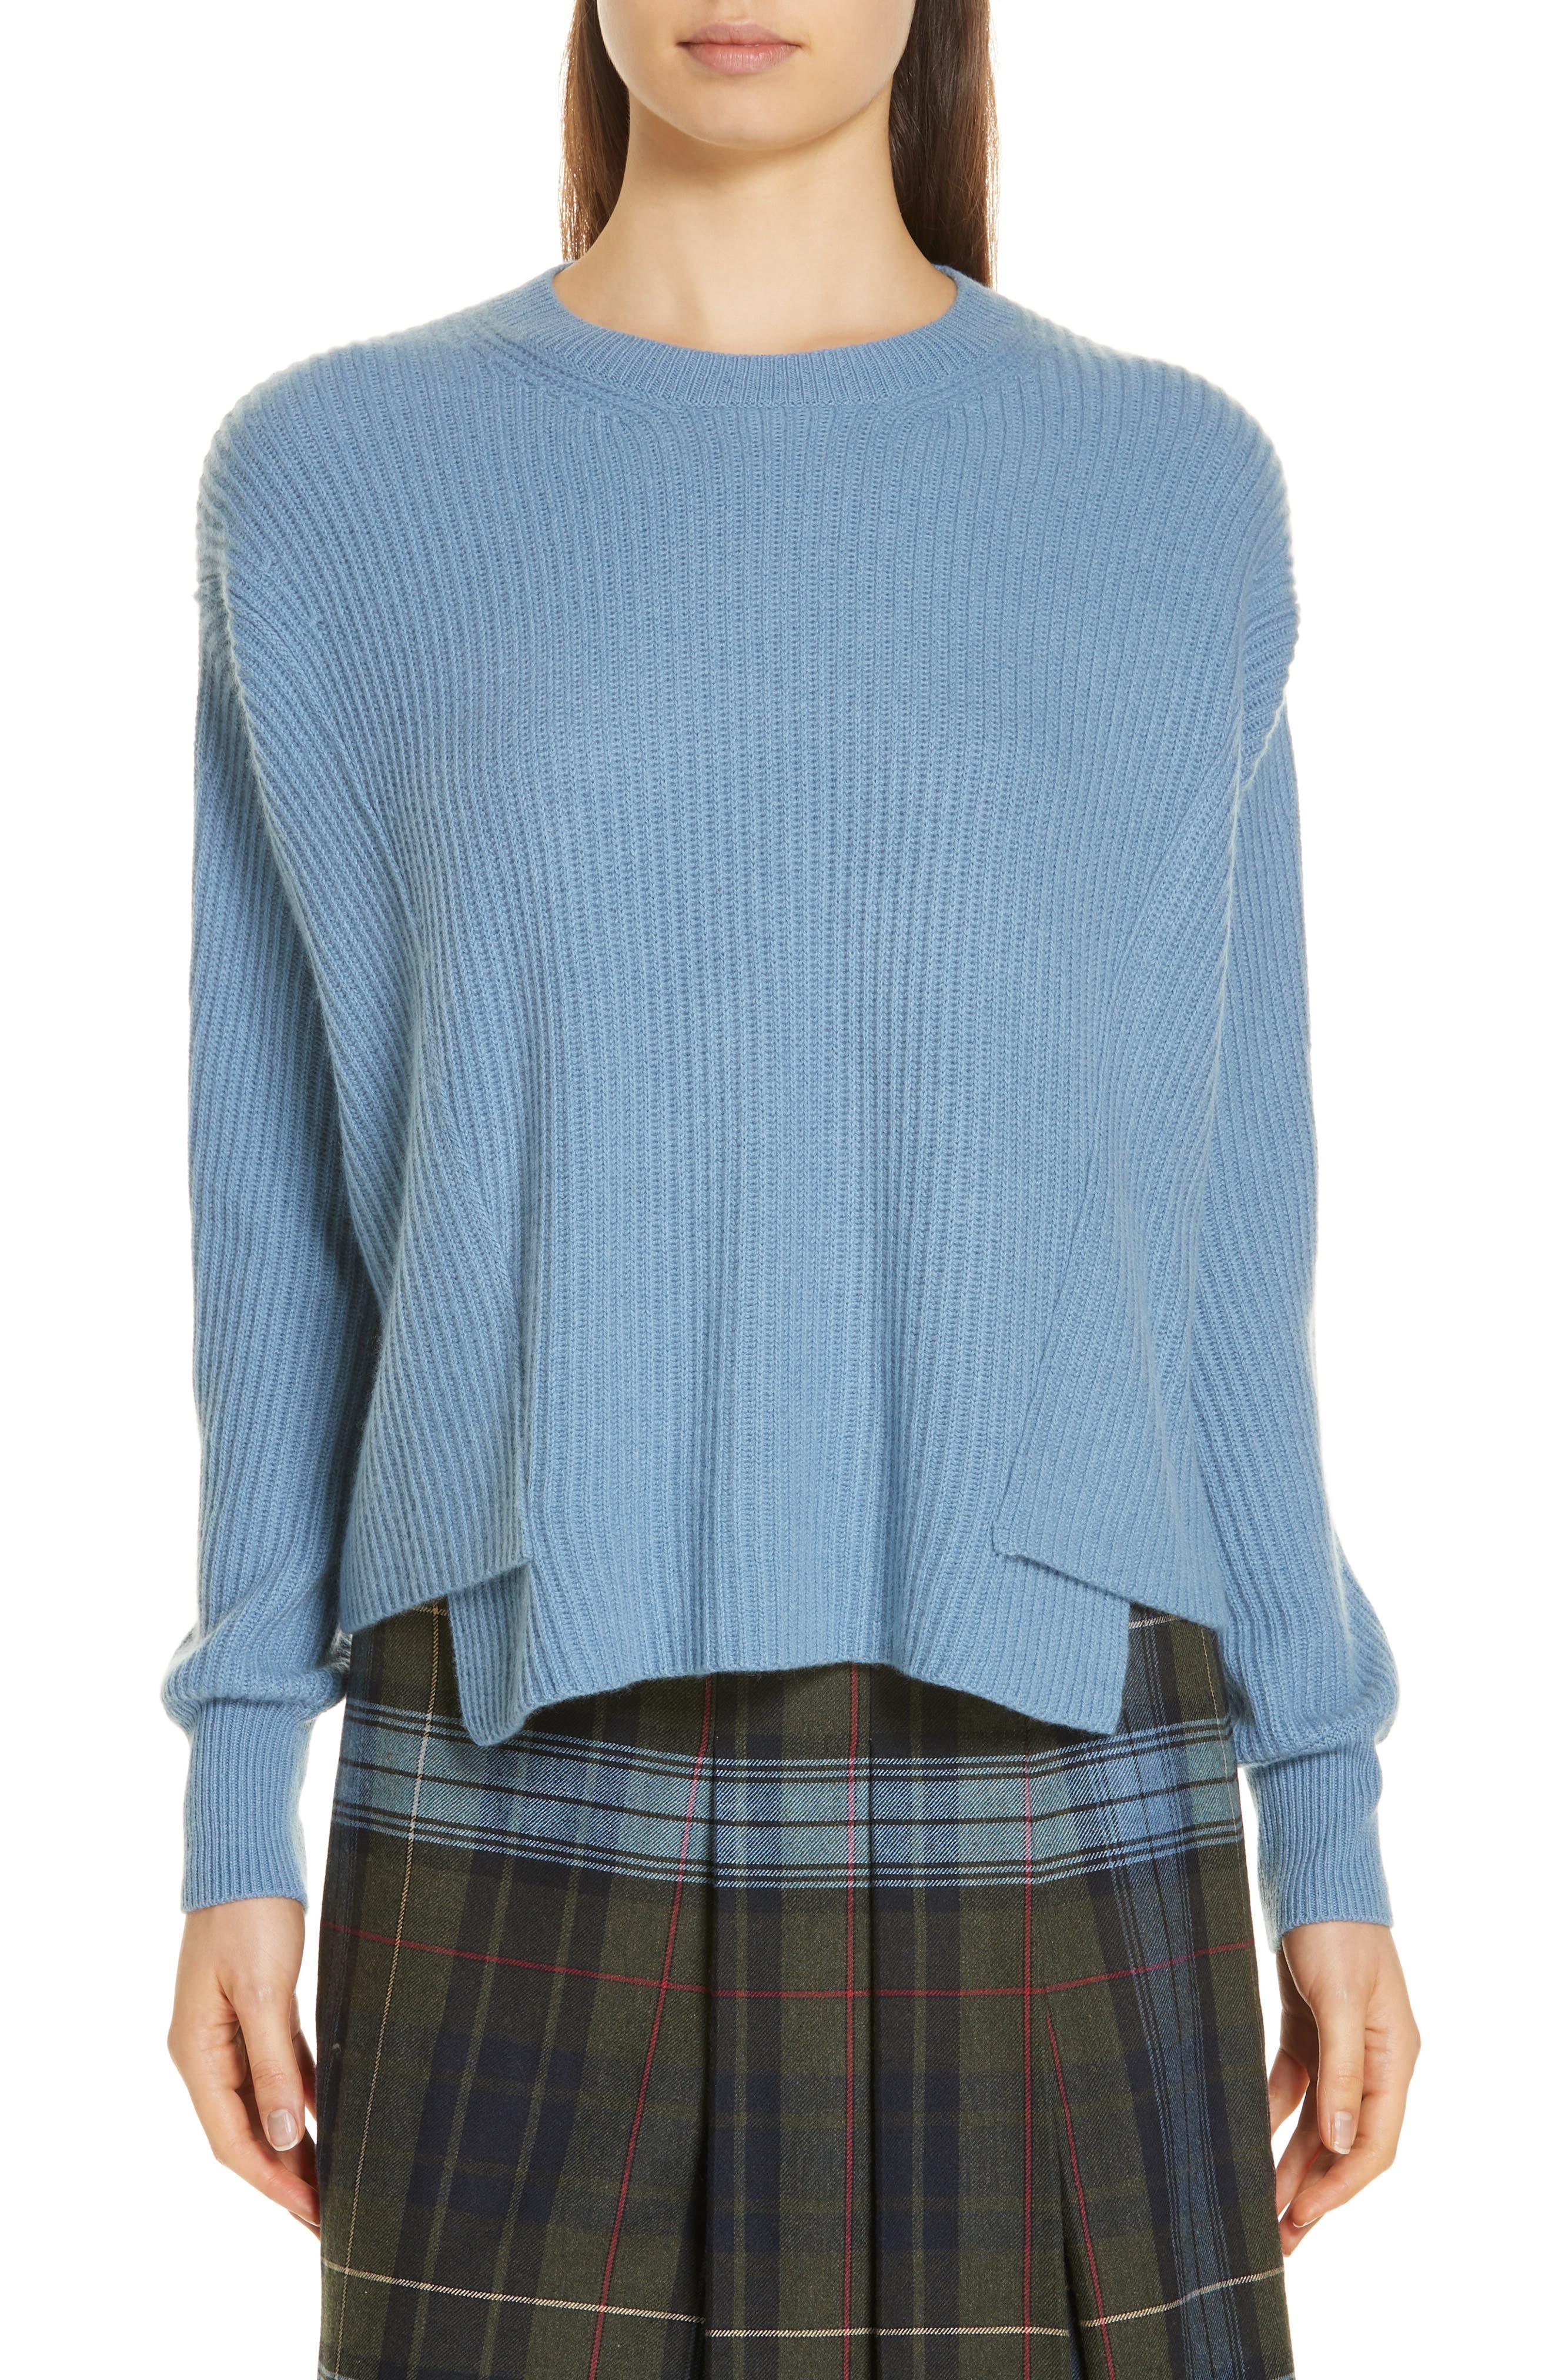 Rib Knit Cashmere Sweater,                             Main thumbnail 1, color,                             420